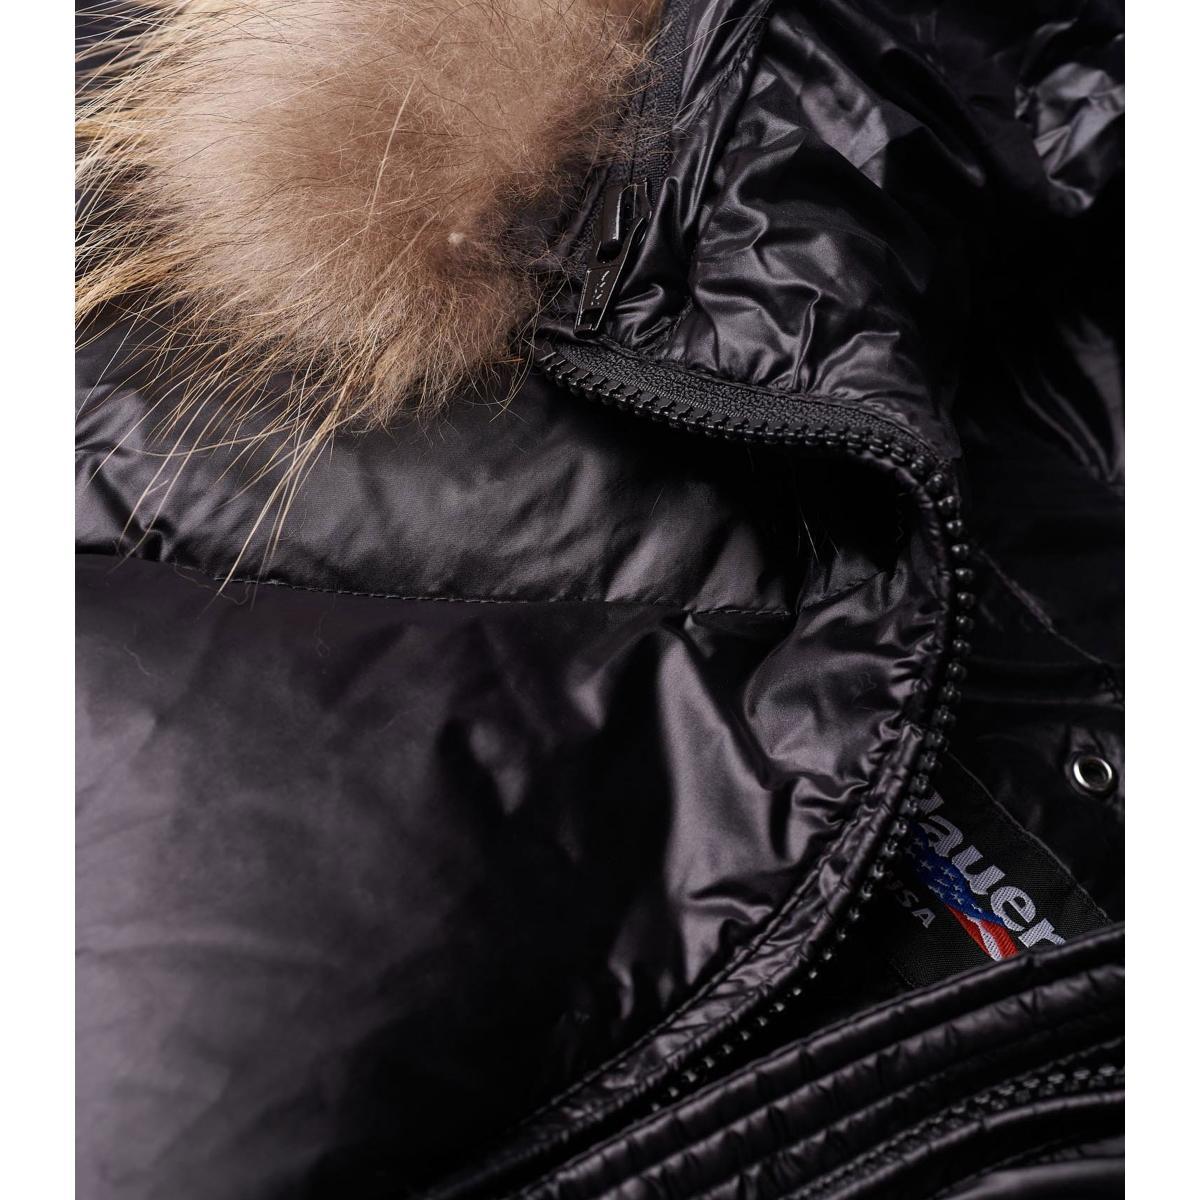 Piumino Blauer Usa Lungo in nylon cangiante Cunningham da donna 19WBLDK03004-005050